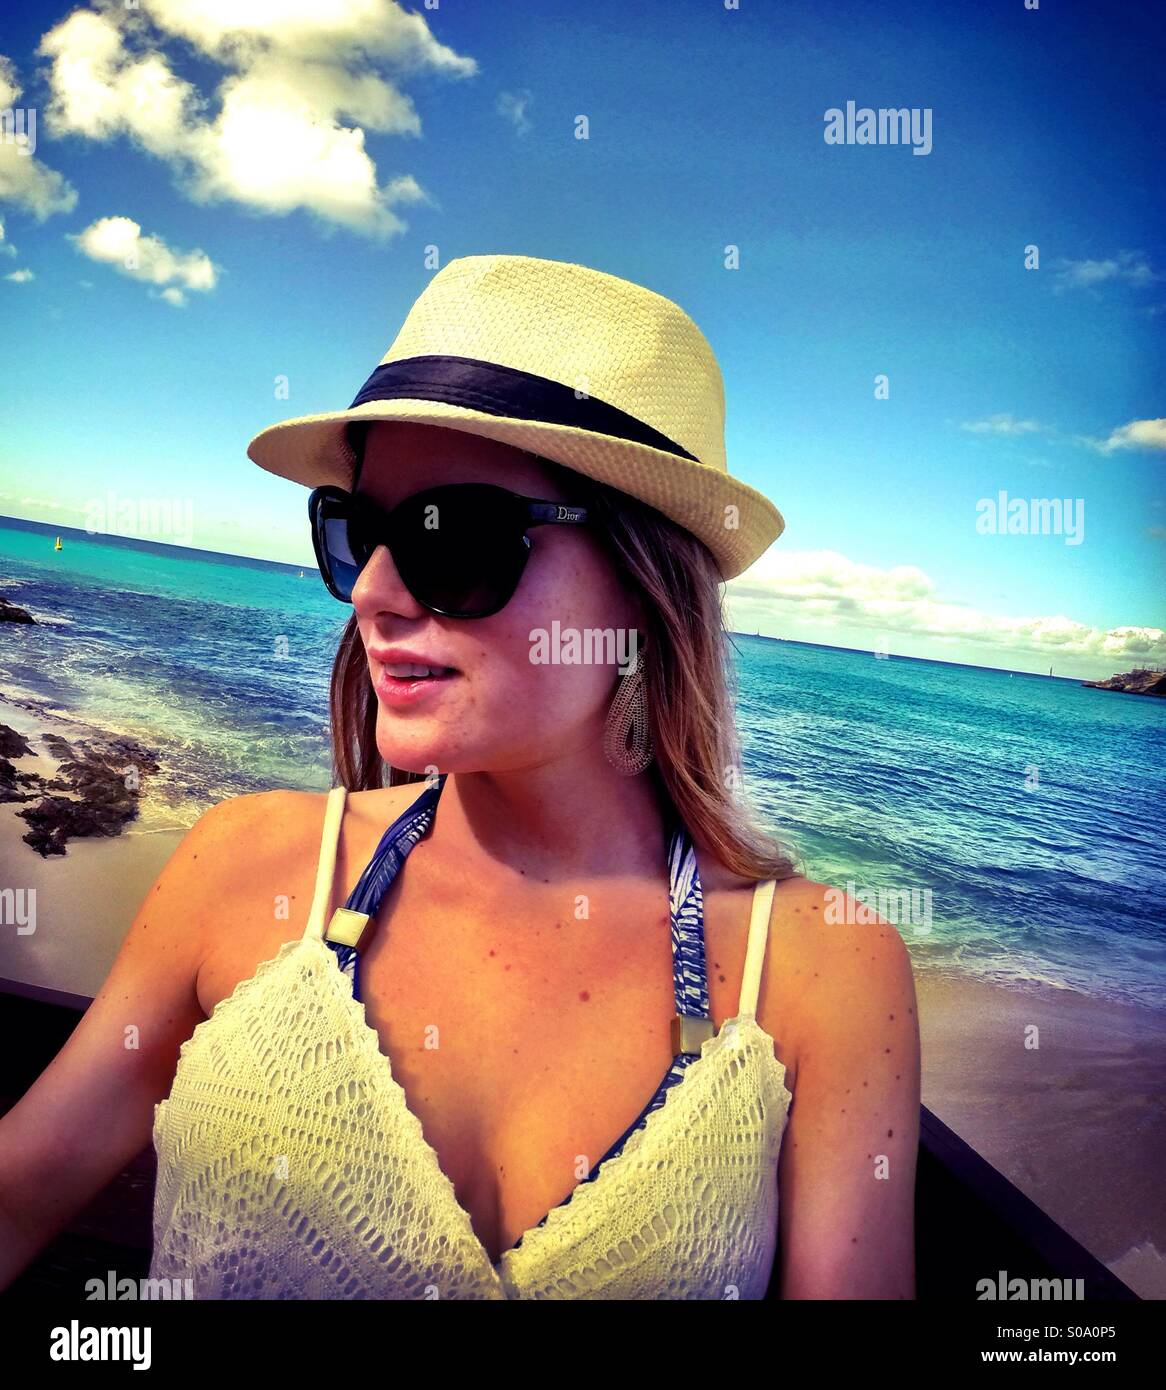 St.Maarten Karibik Inseln Portrait - Mode, Strand, Reisen, lifestyle Stockbild